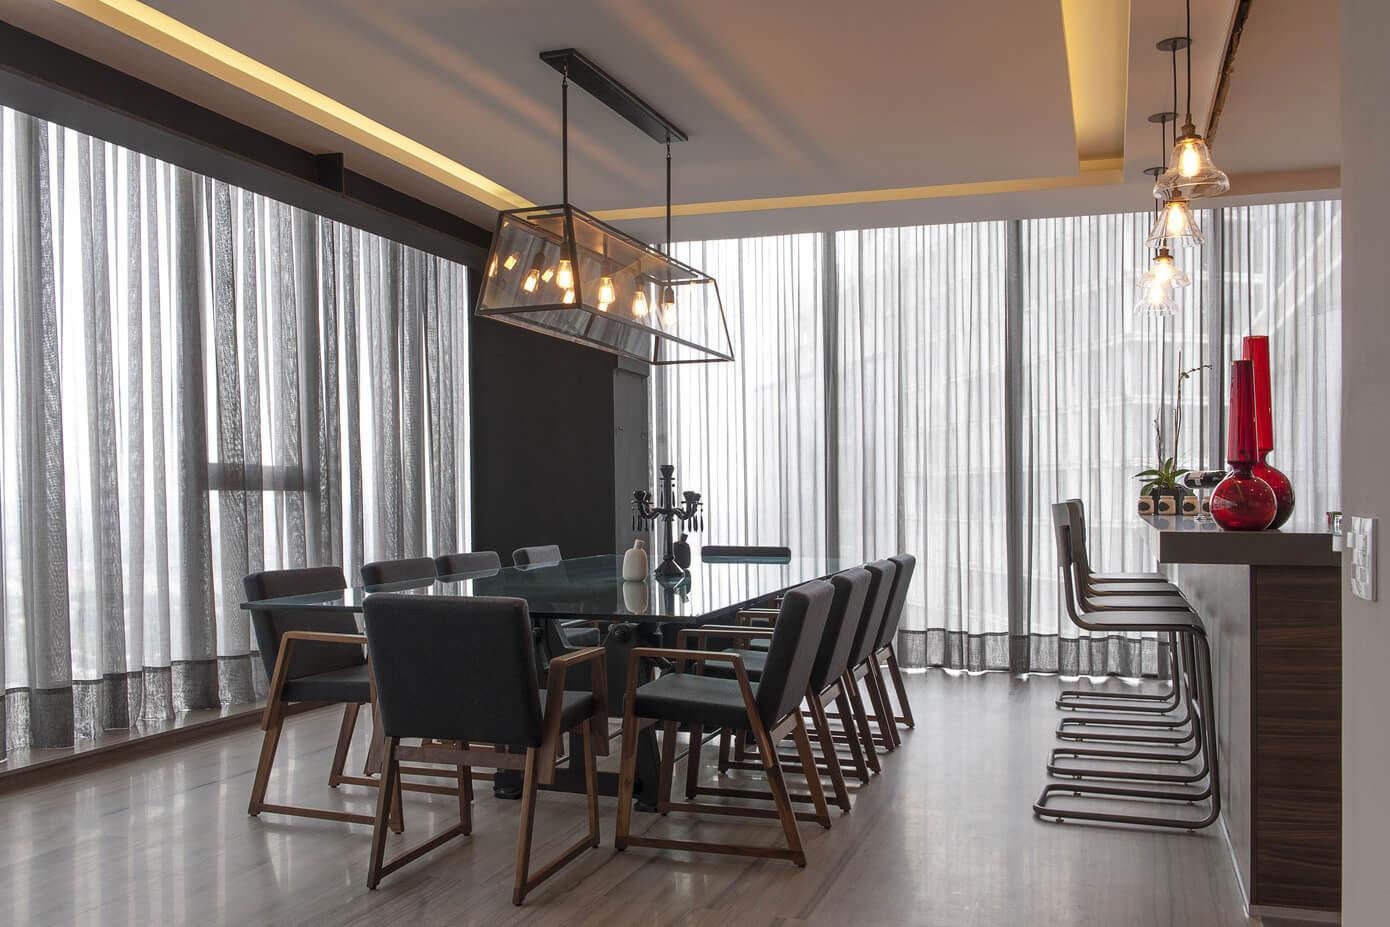 Contemporary CM Apartment in Mexico City by Kababie Arquitectos-06